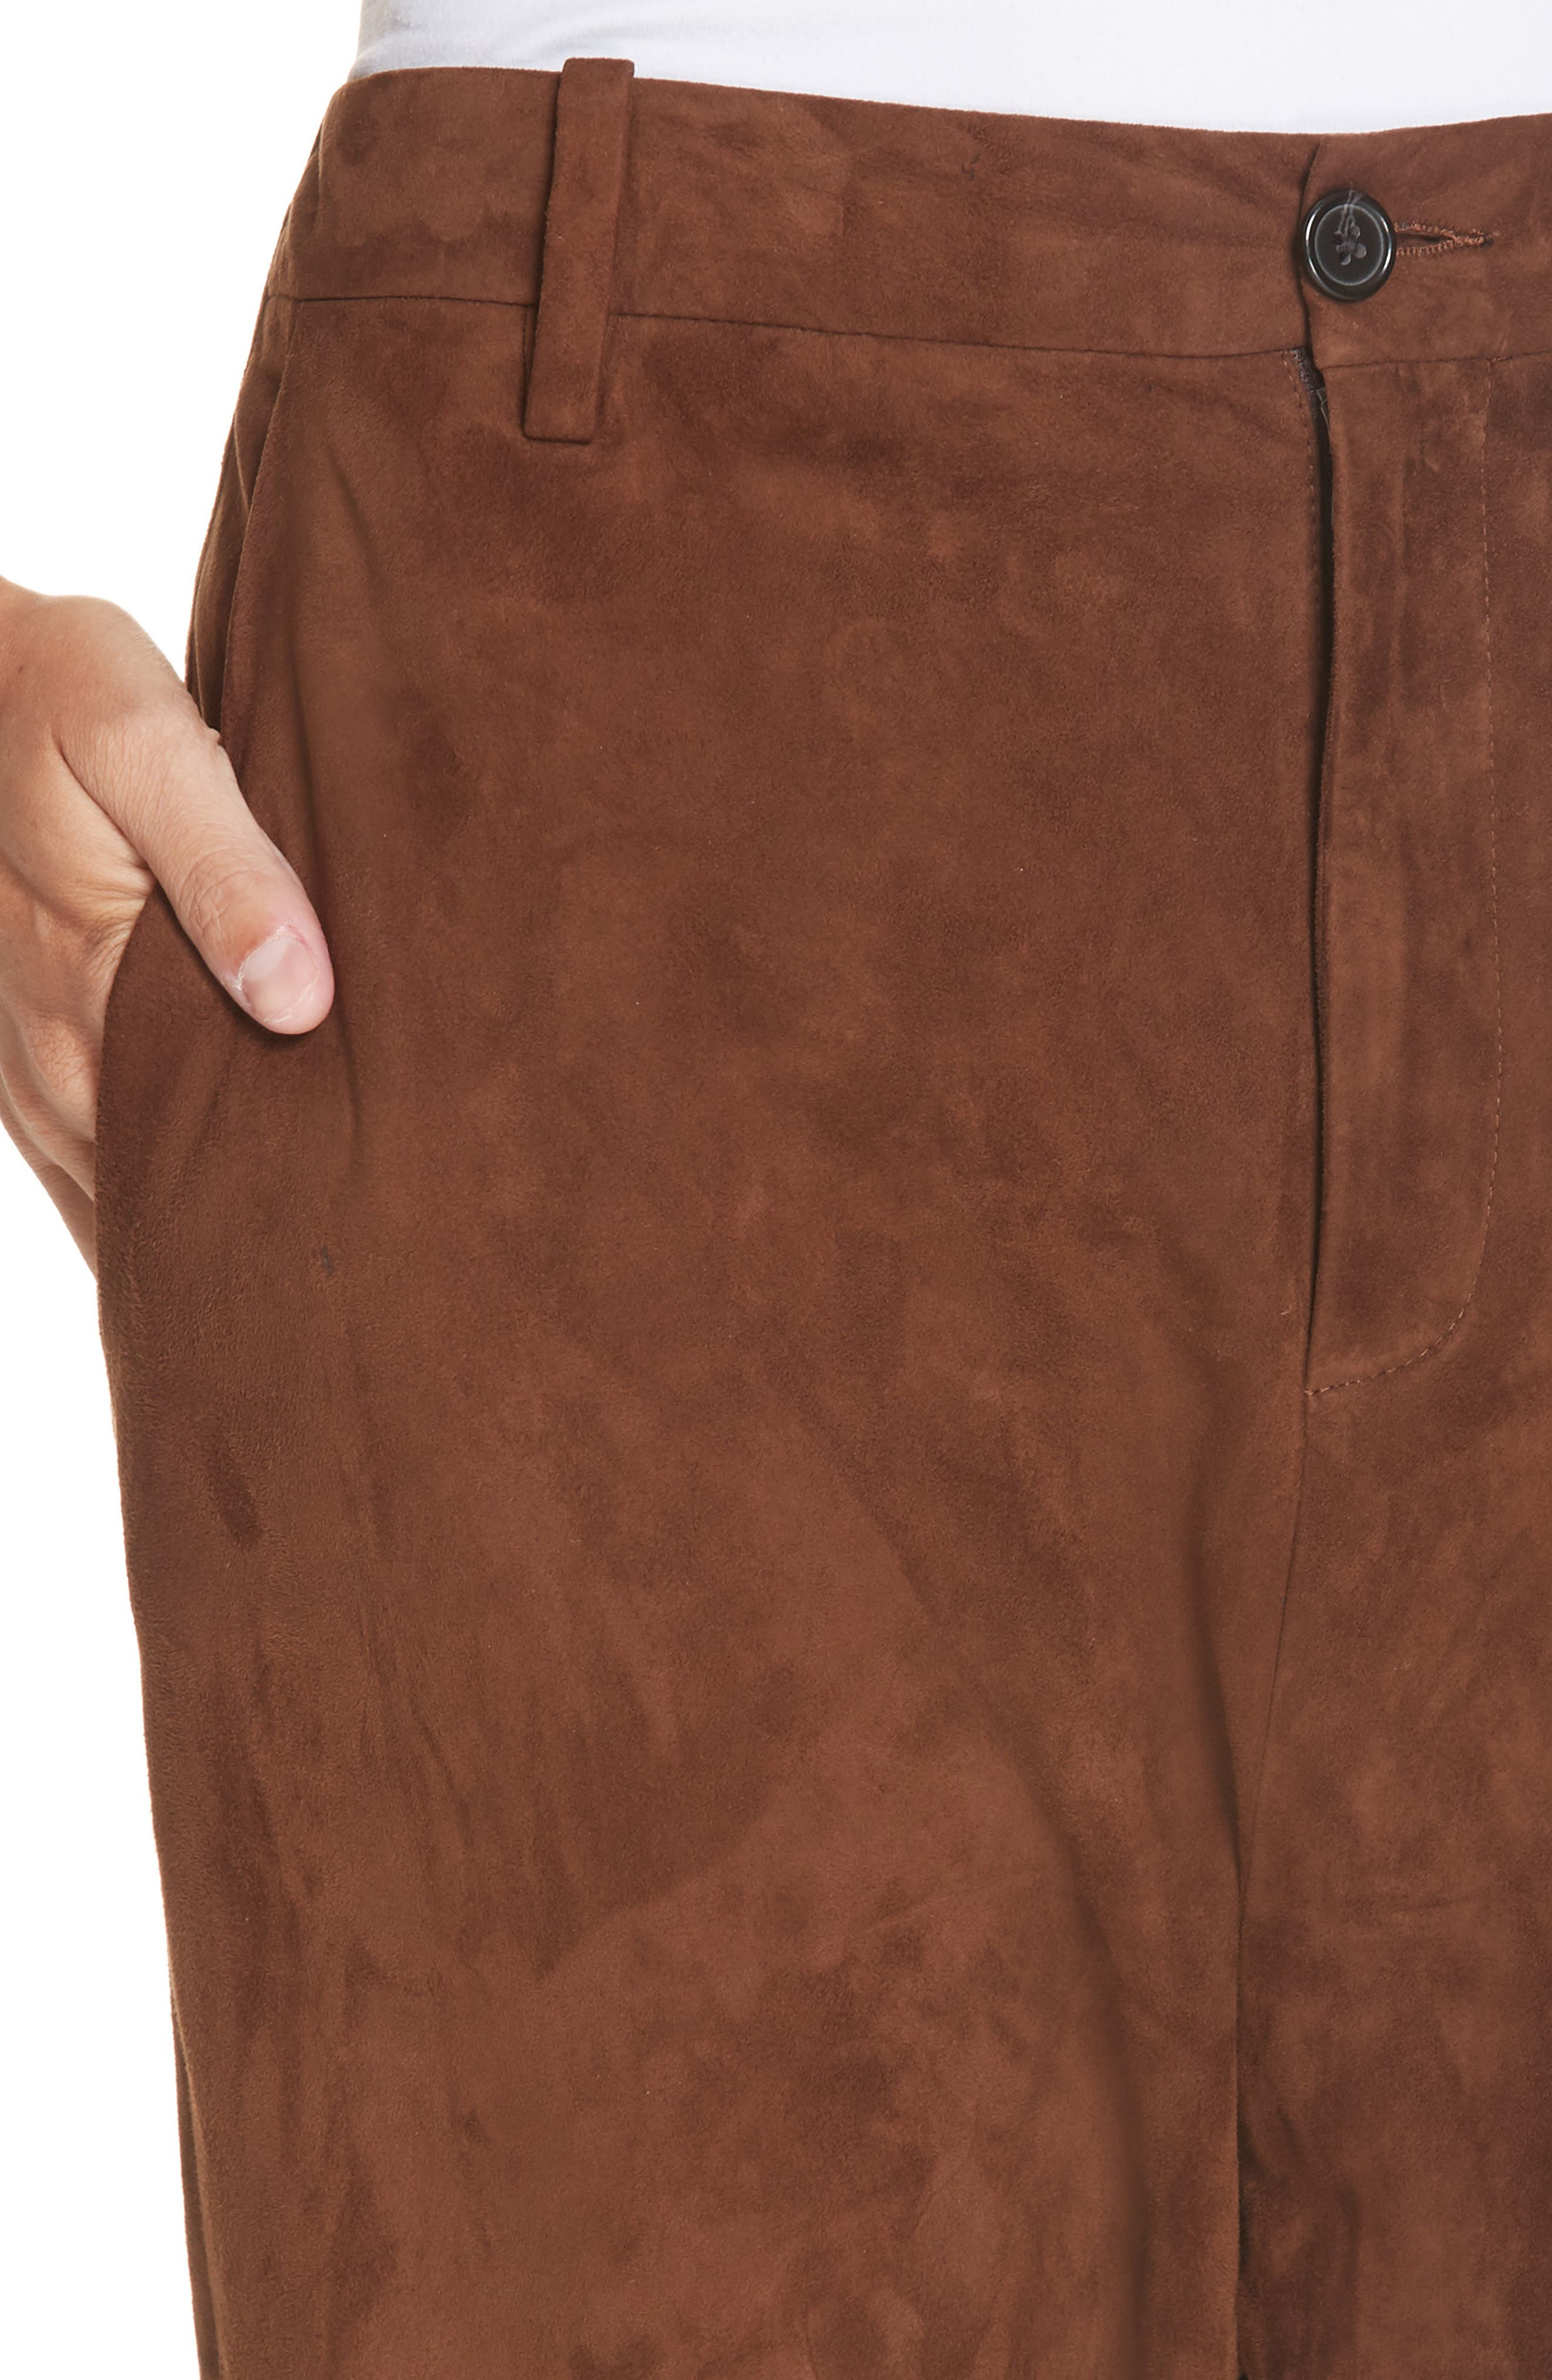 NILI LOTAN, Paris Leather Pants, Alternate thumbnail 5, color, DARK COGNAC